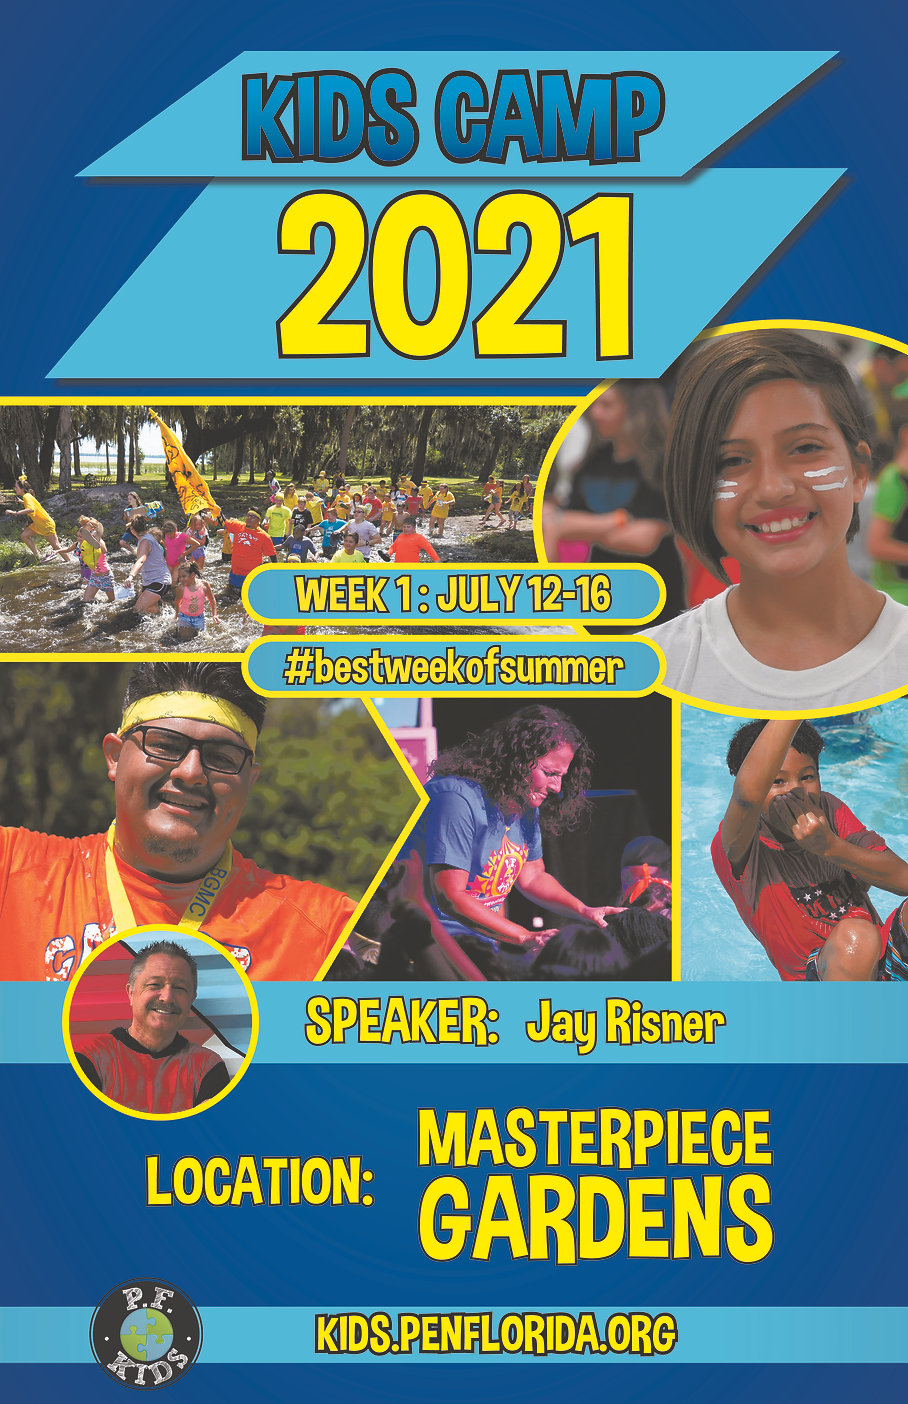 KIDS CAMP 2021 Poster-Front.jpg